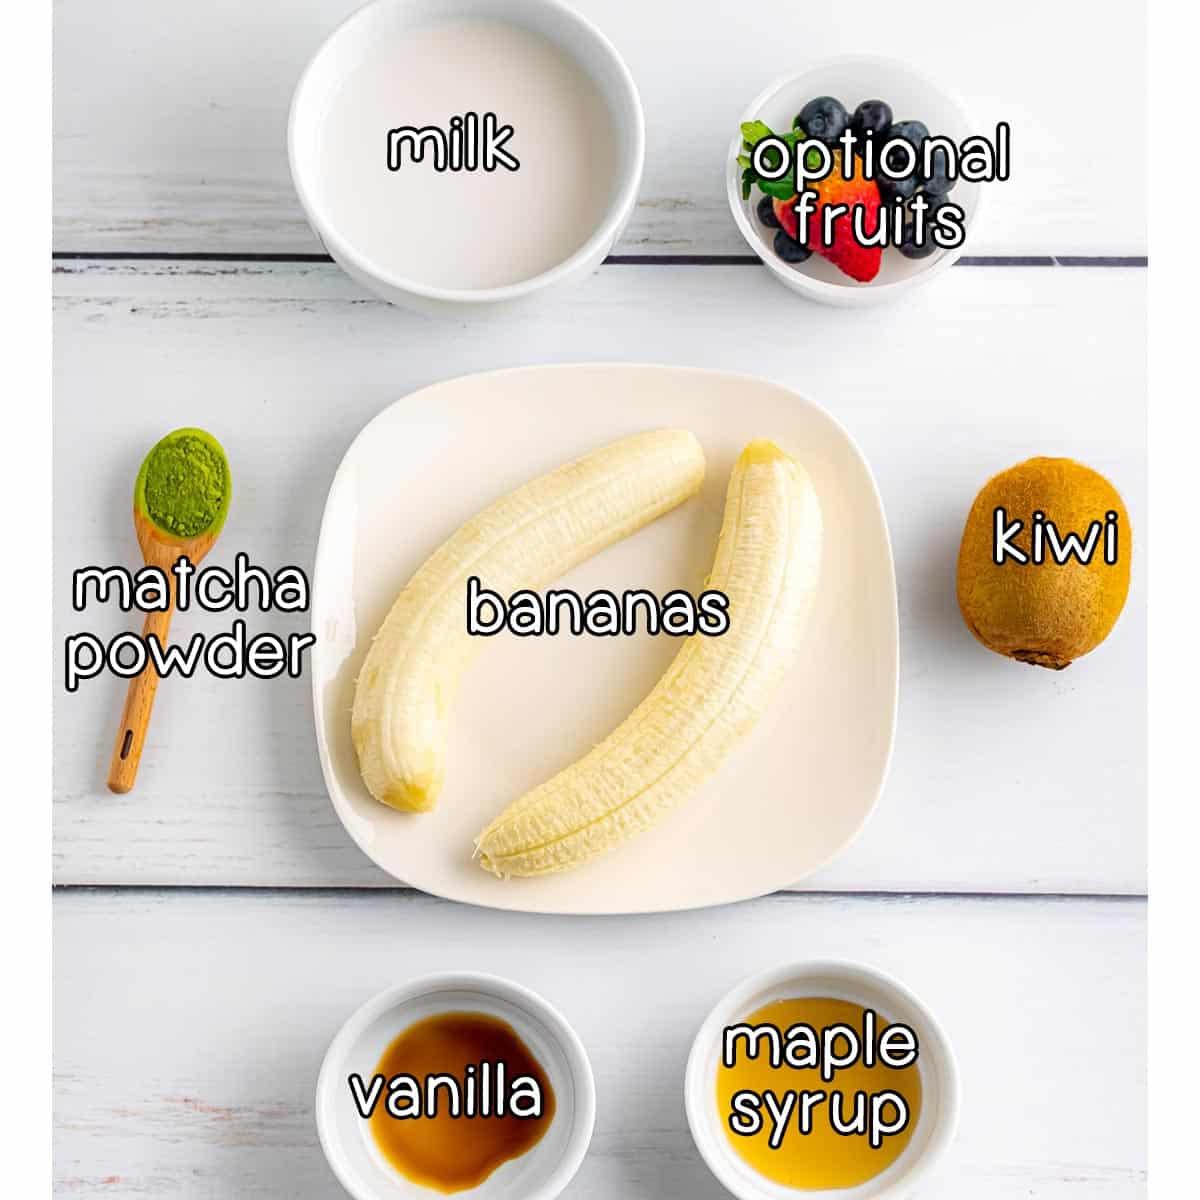 Overhead shot of ingredients- bananas, milk, fruits, kiwi, maple syrup, vanilla, and match powder.